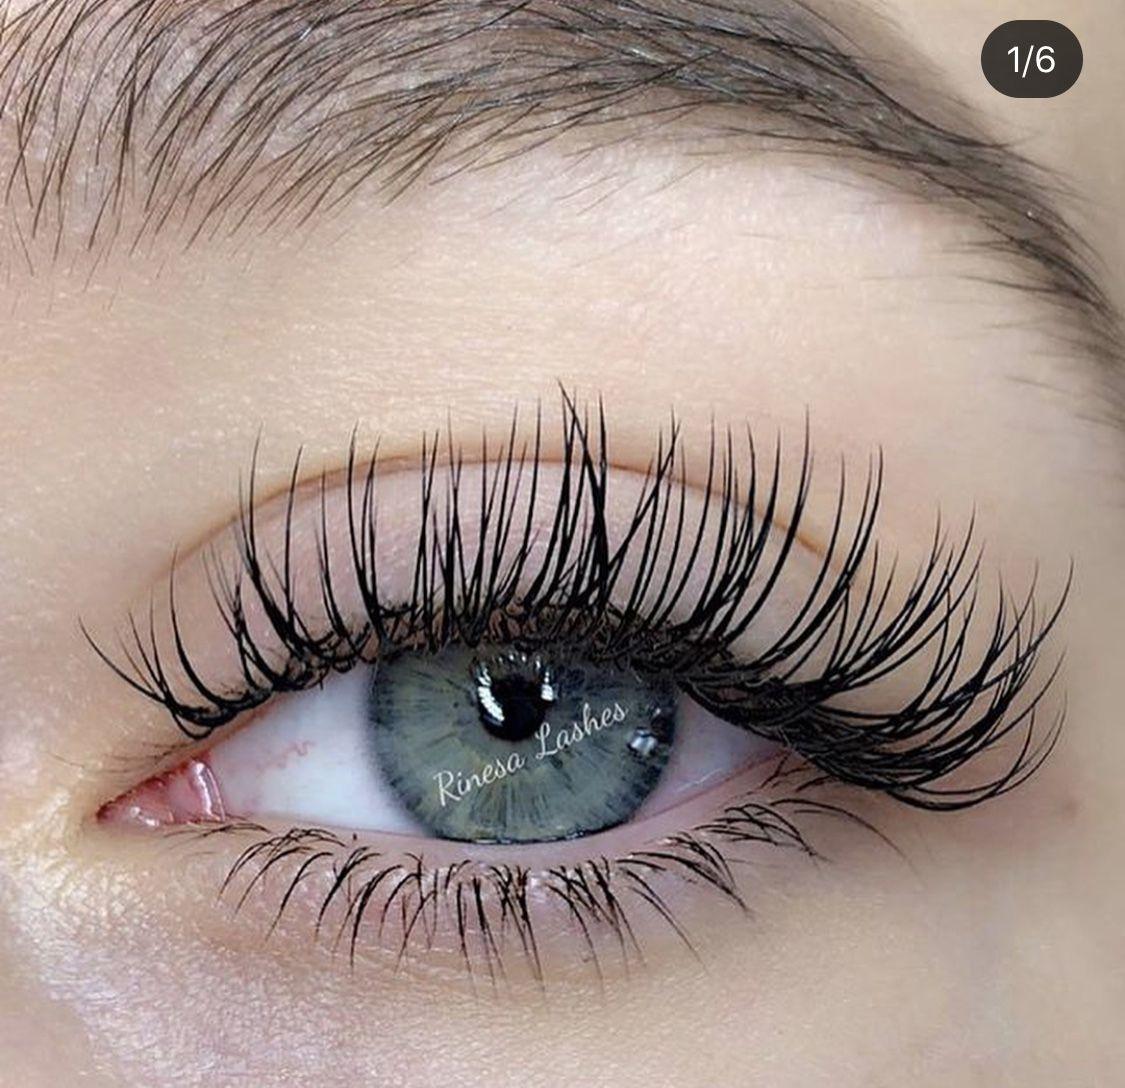 Lash Extensions in 2020 Eyelash extentions, Eyelash